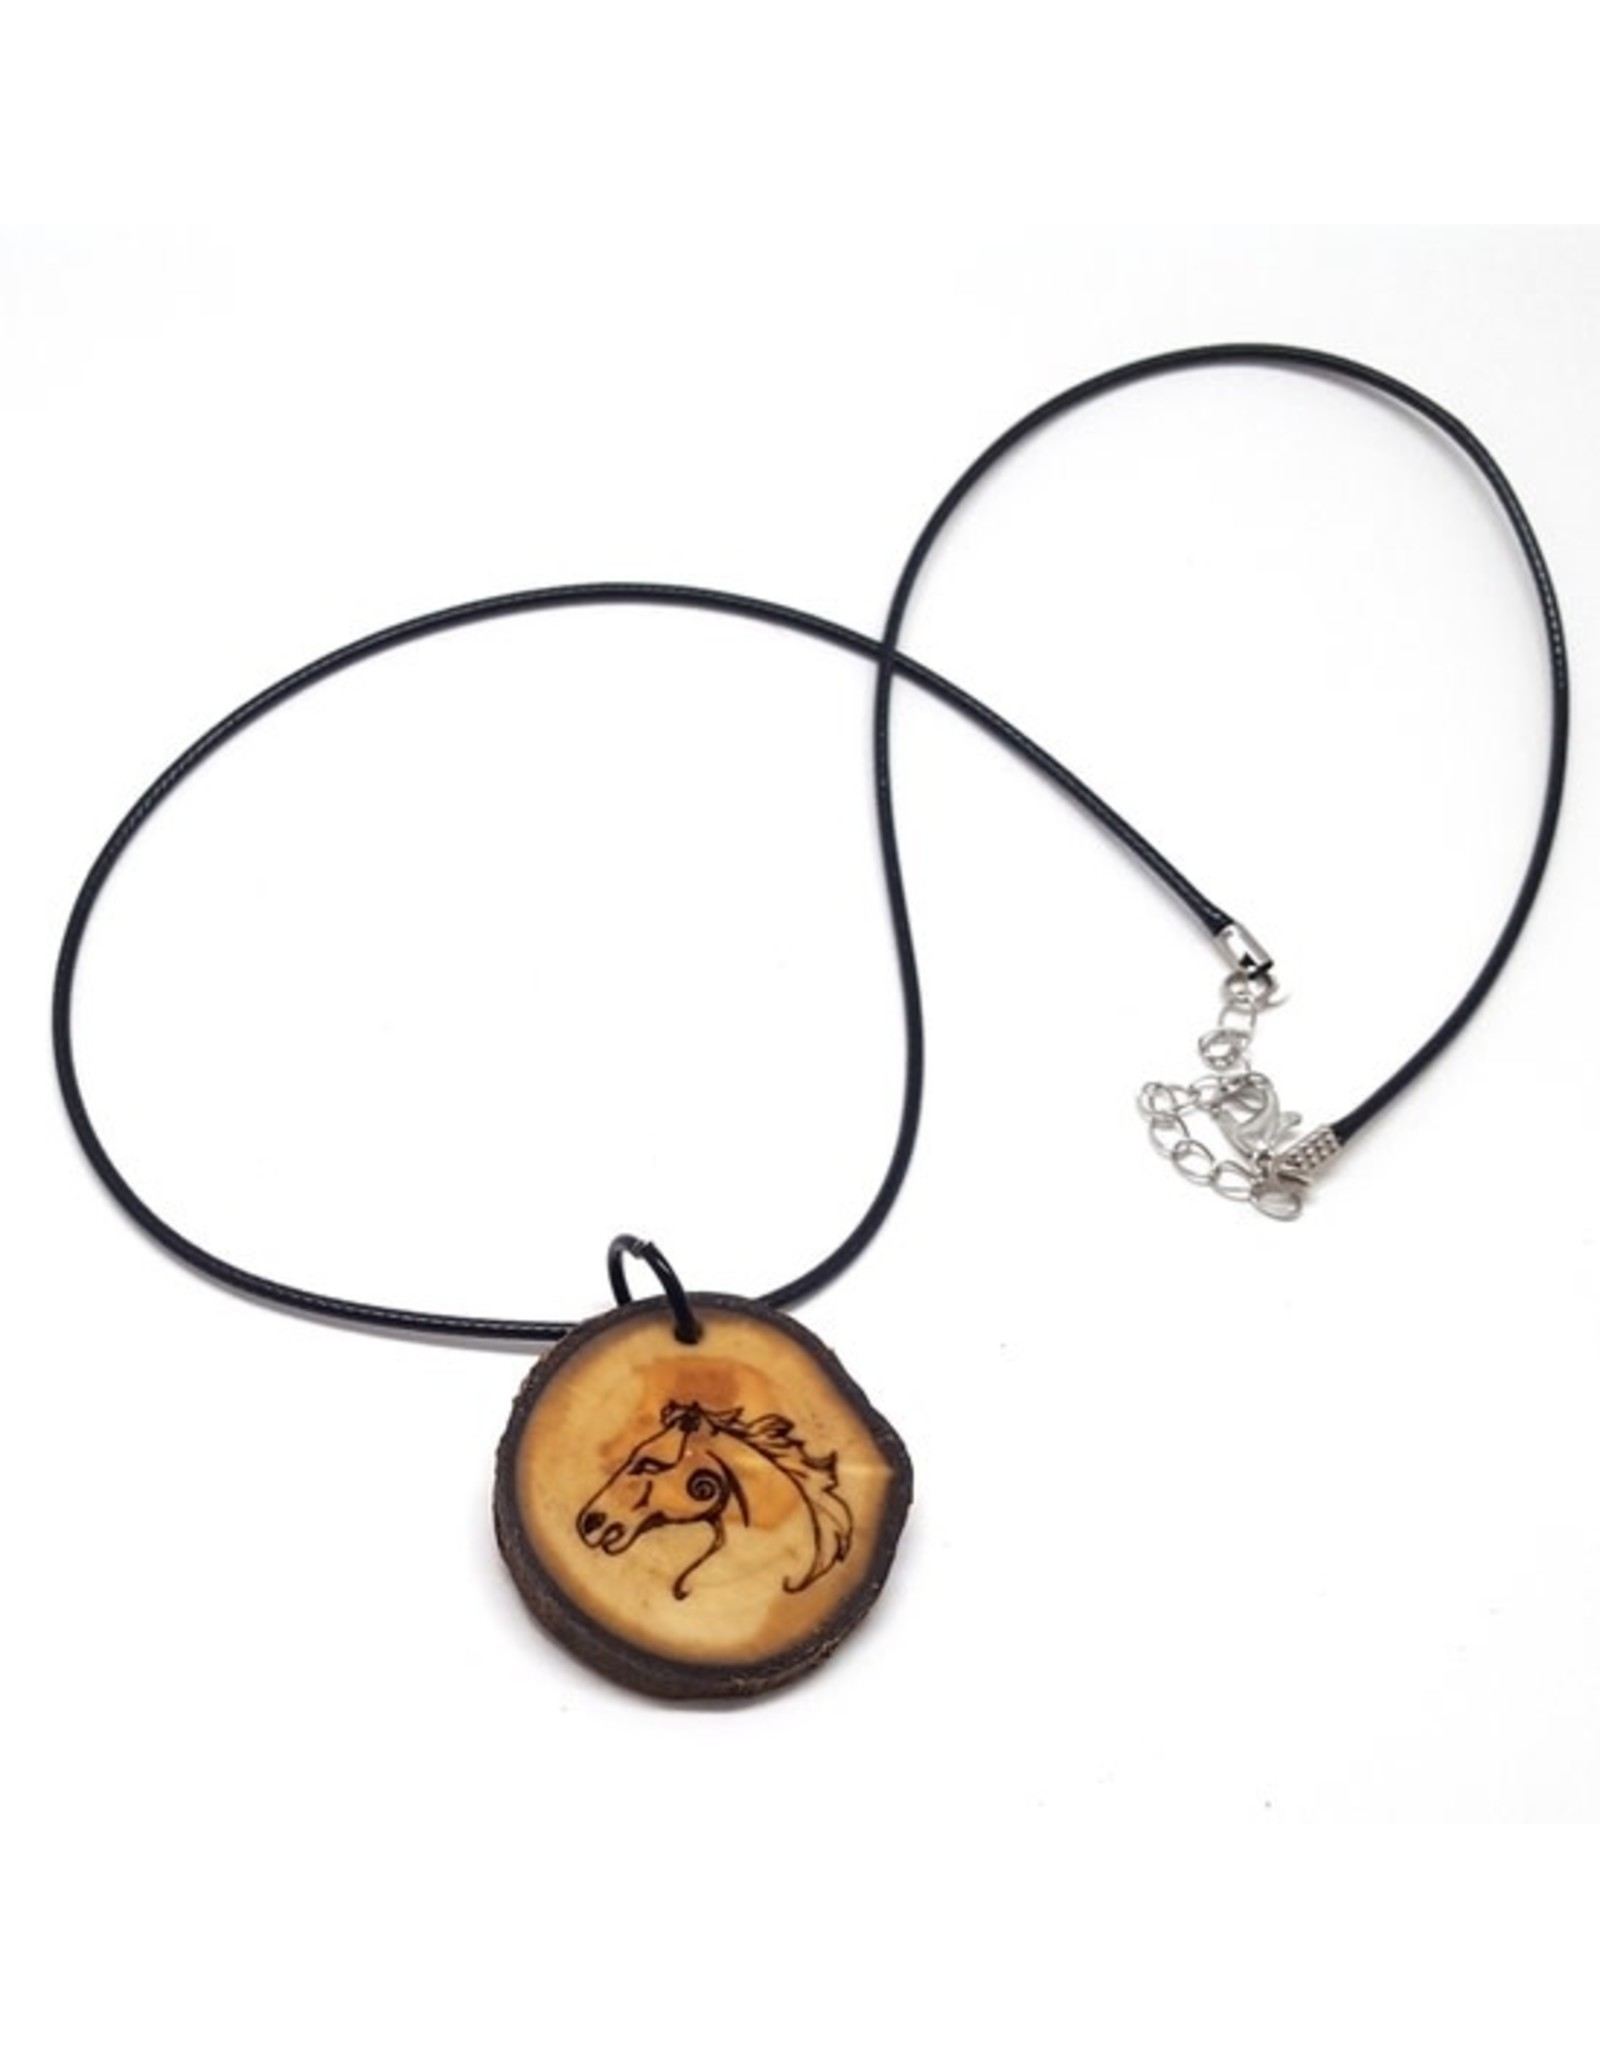 Celtic Horse Wooden Pendant Necklace, Animal Symbol